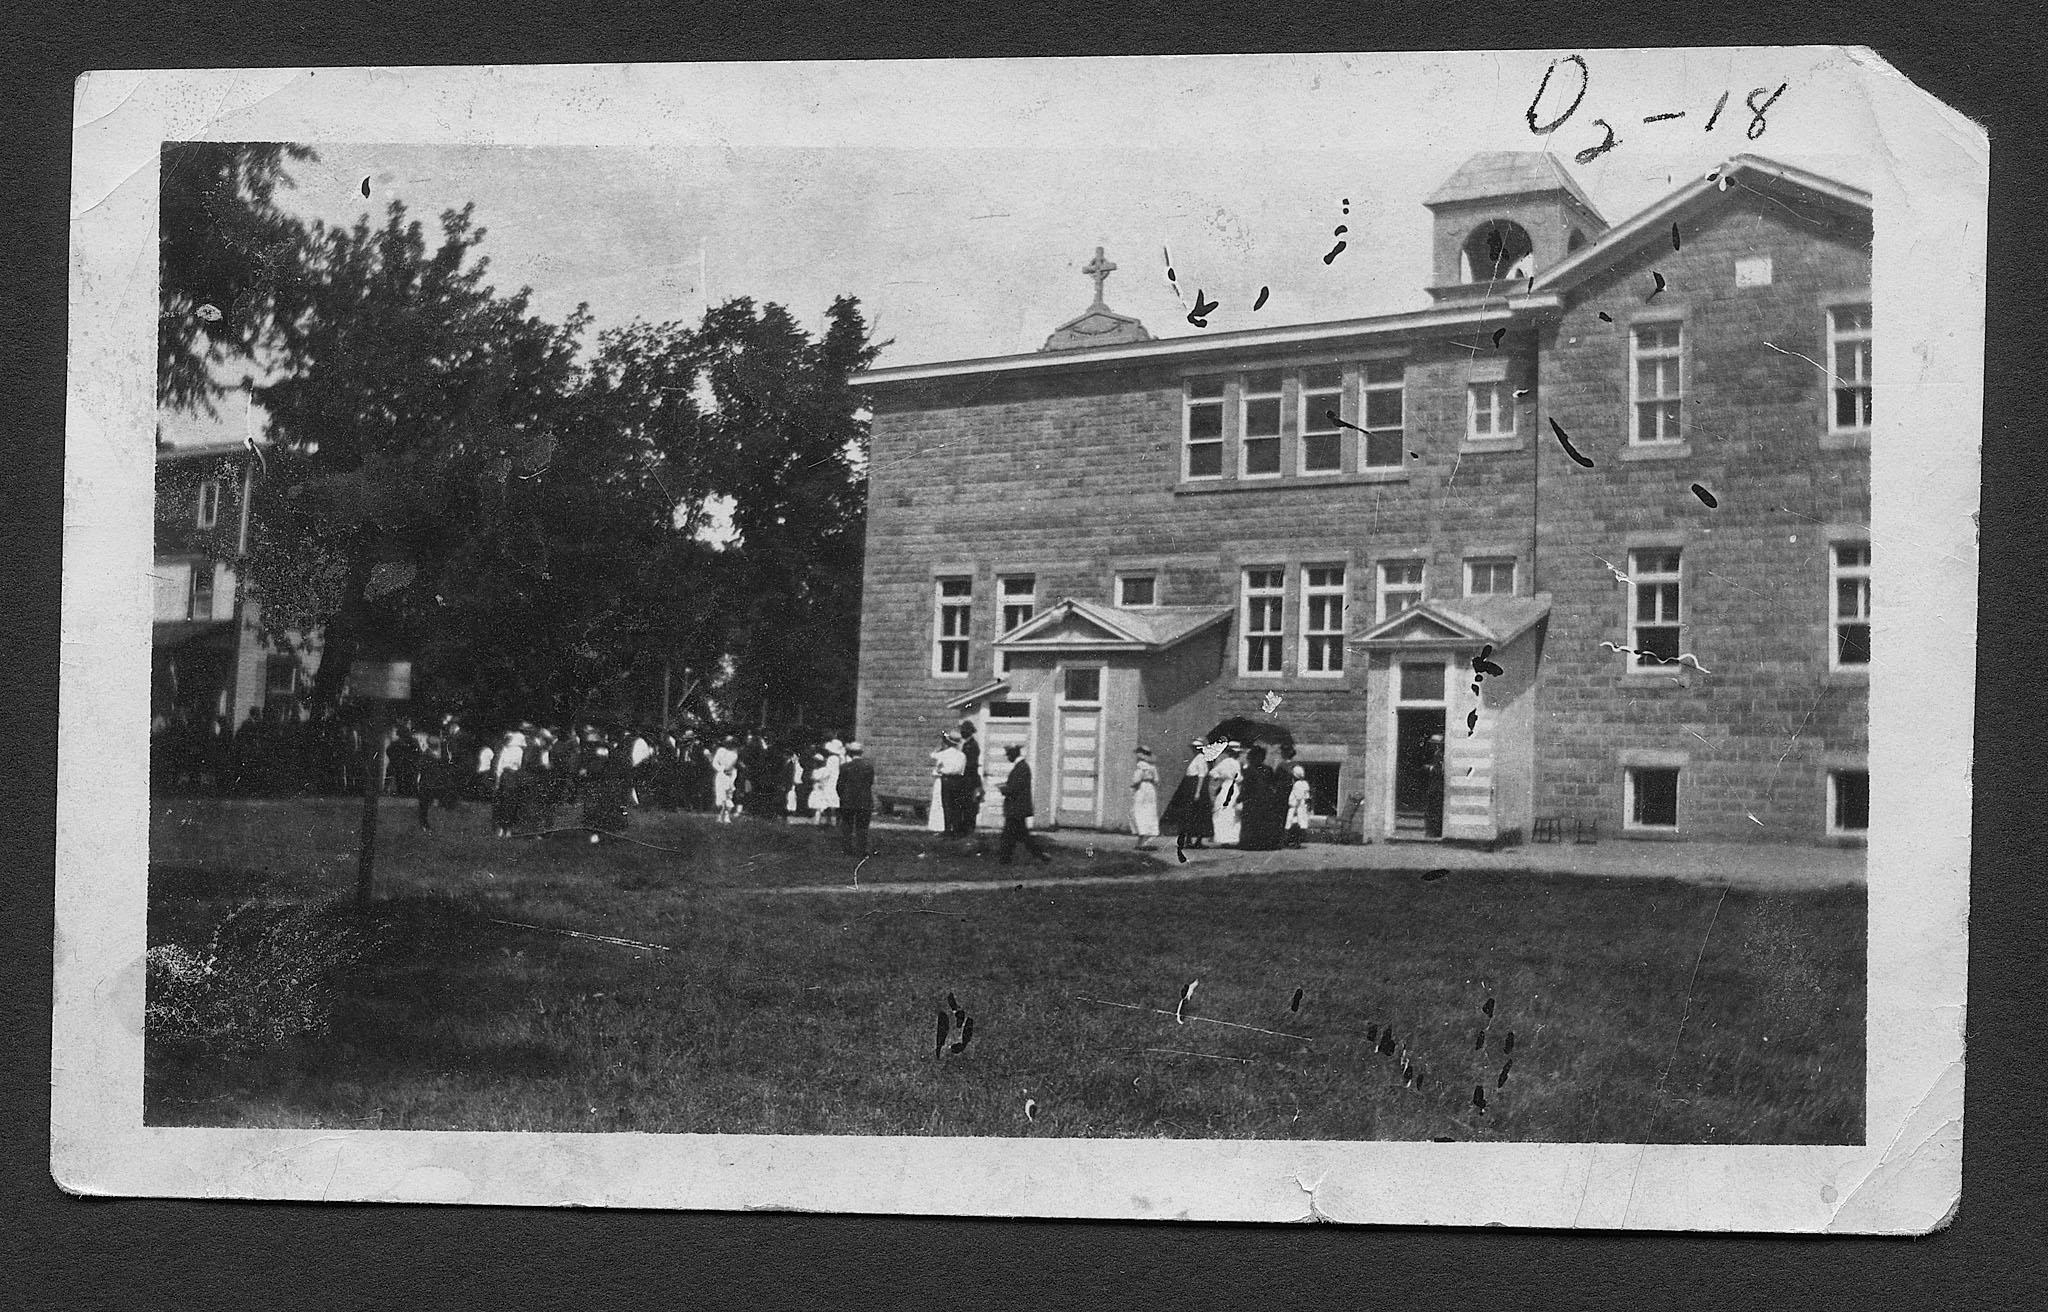 St. Michael's School, Douglas, Ontario 1910